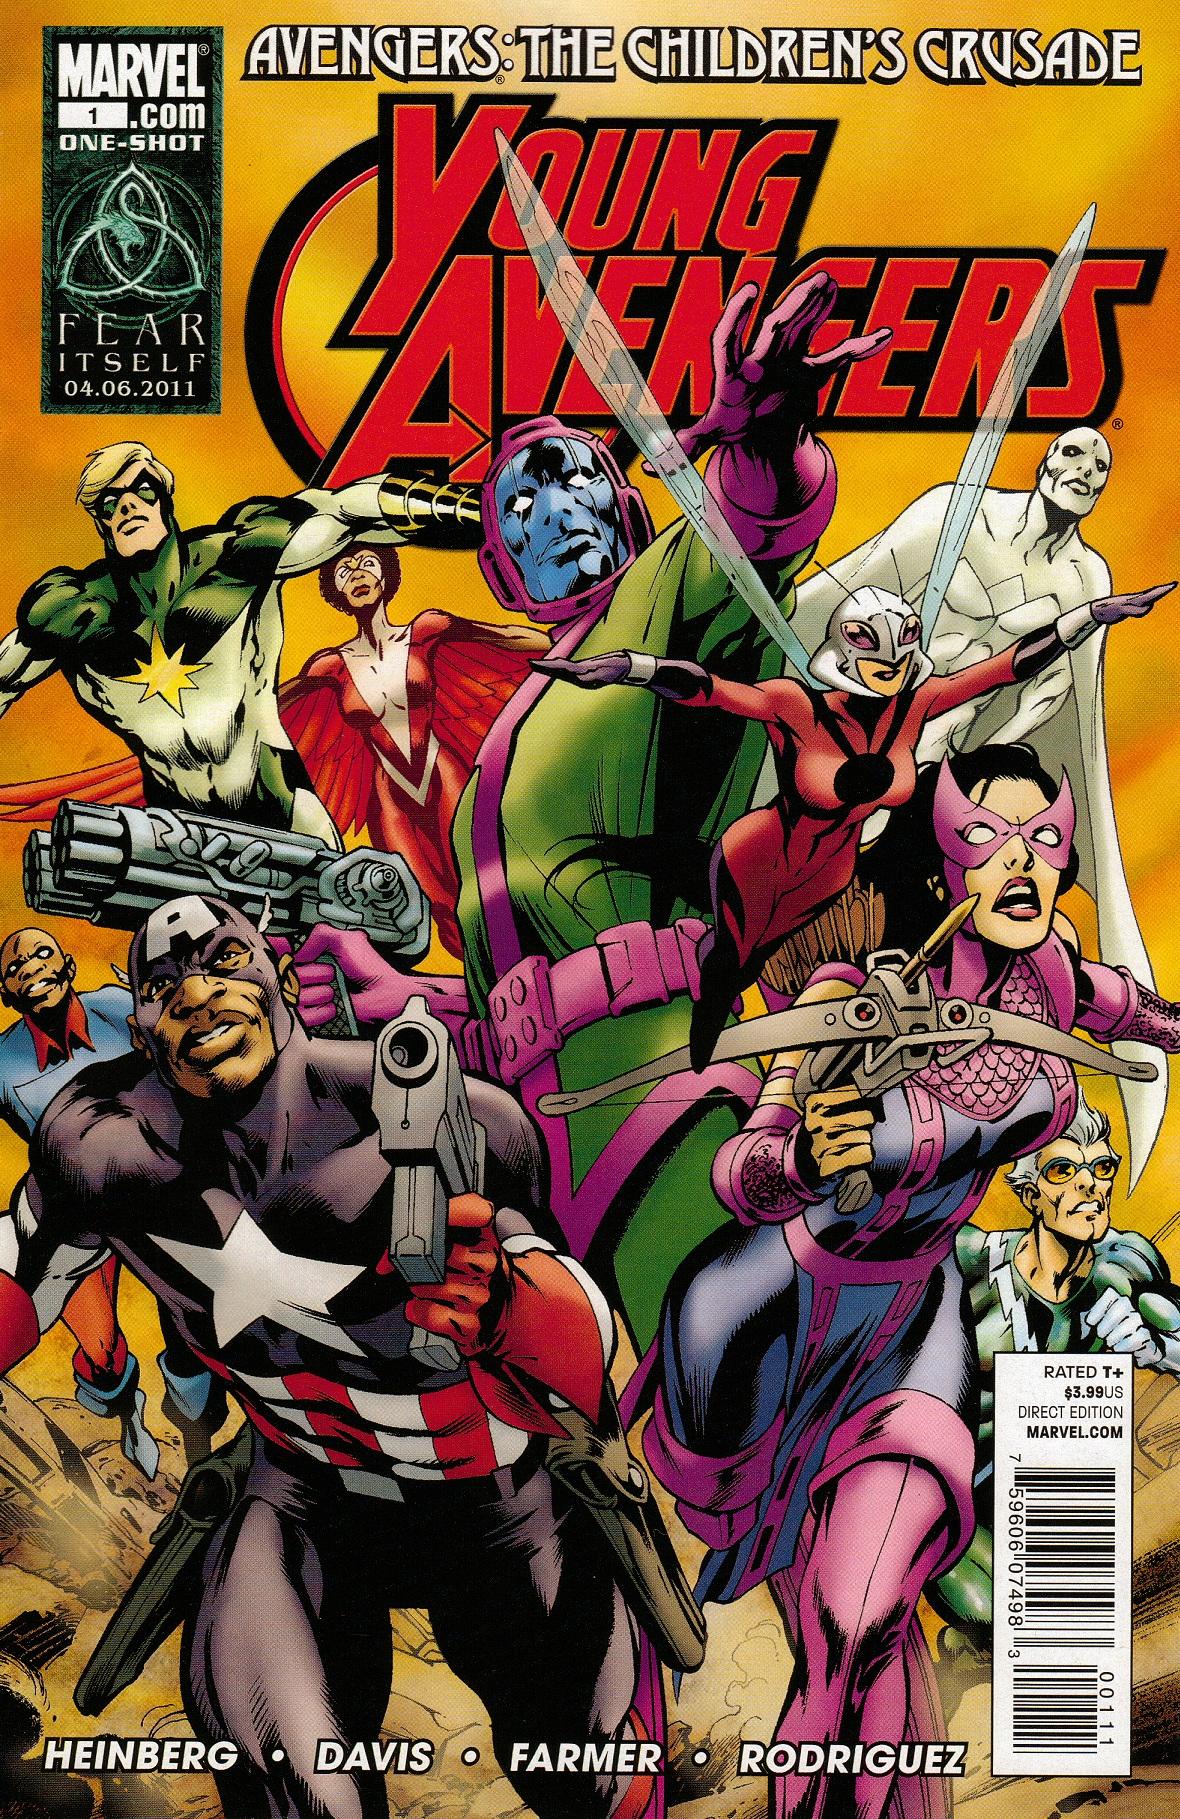 Avengers The Children's Crusade Young Avengers Vol 1 1.jpg